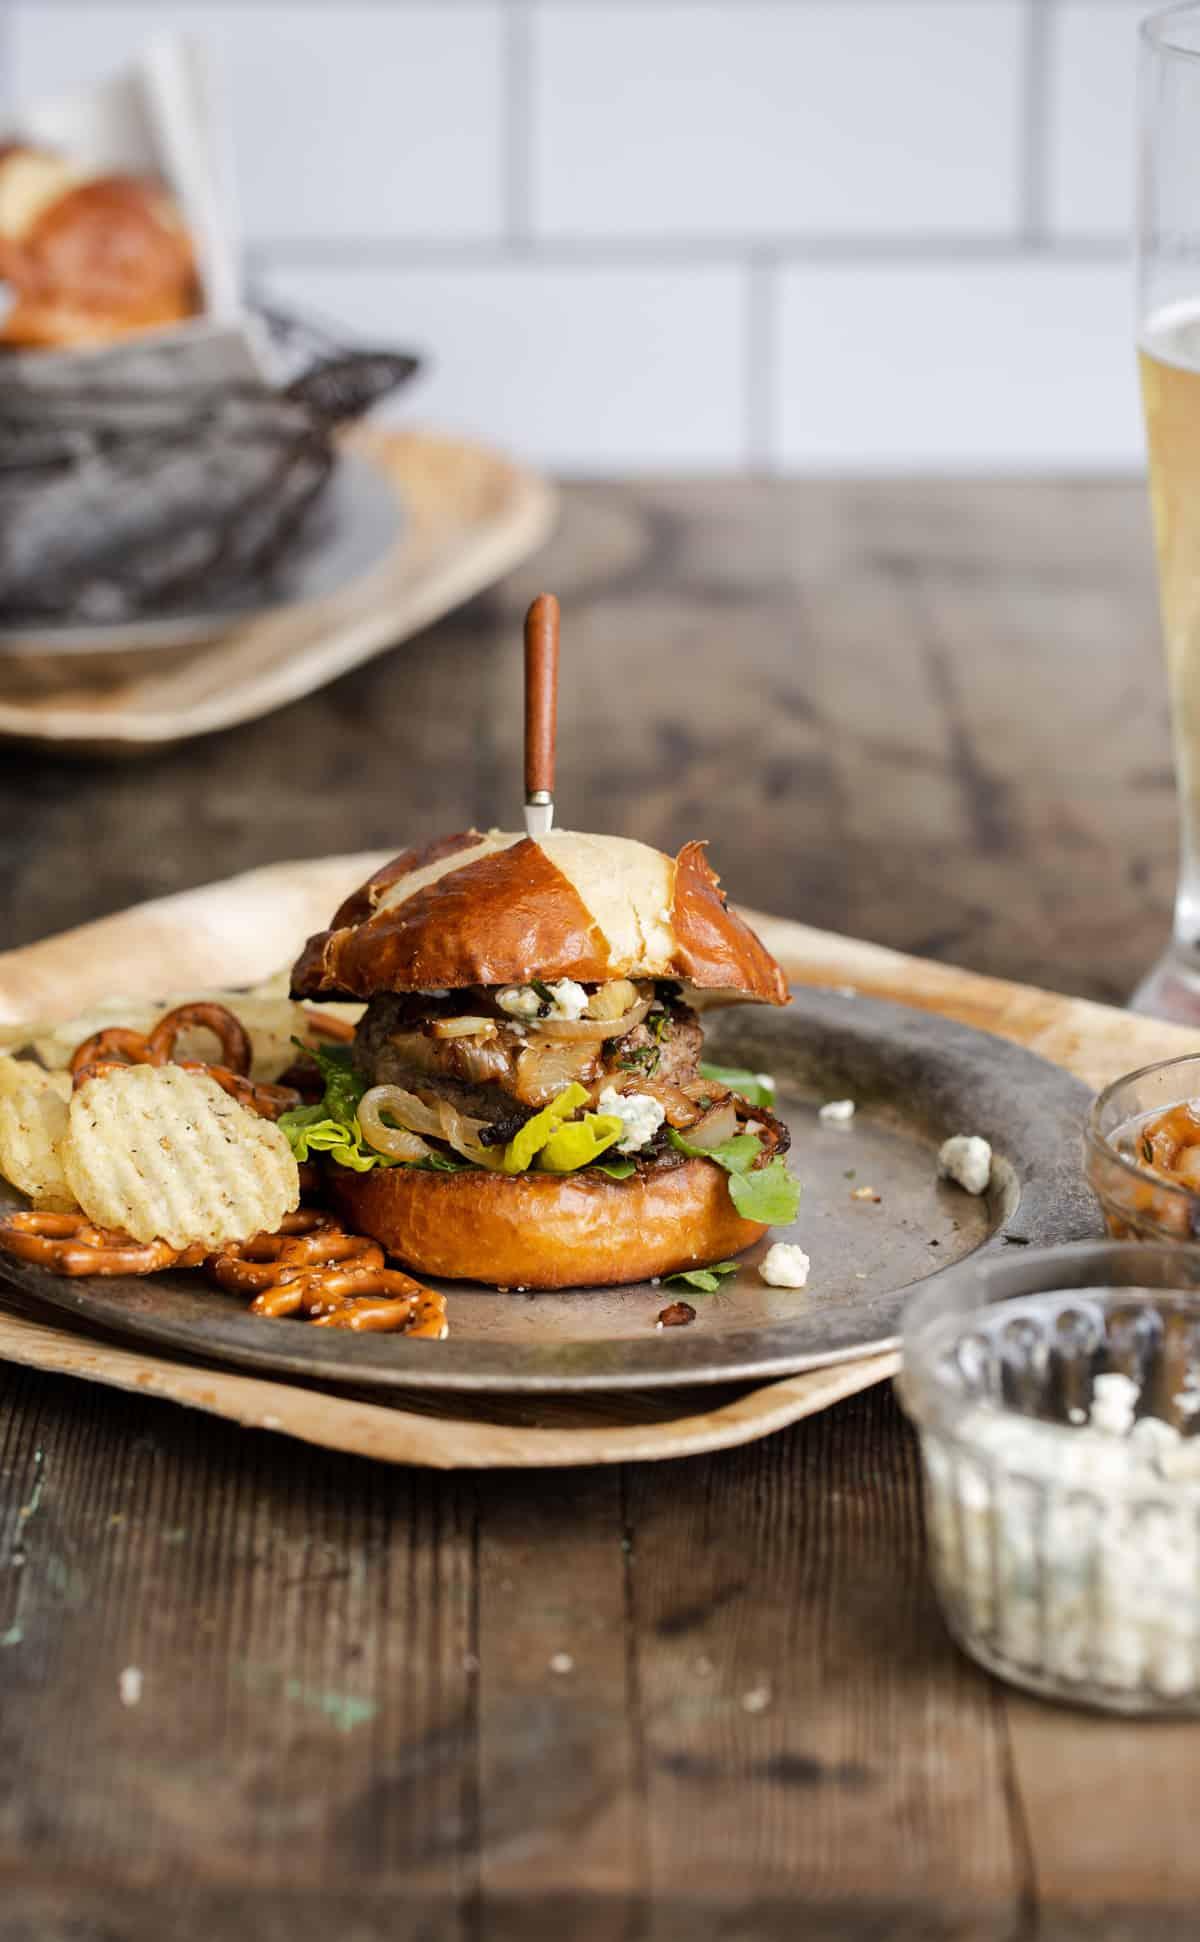 Blue cheese stuffed burger with pretzels on pretzel bun